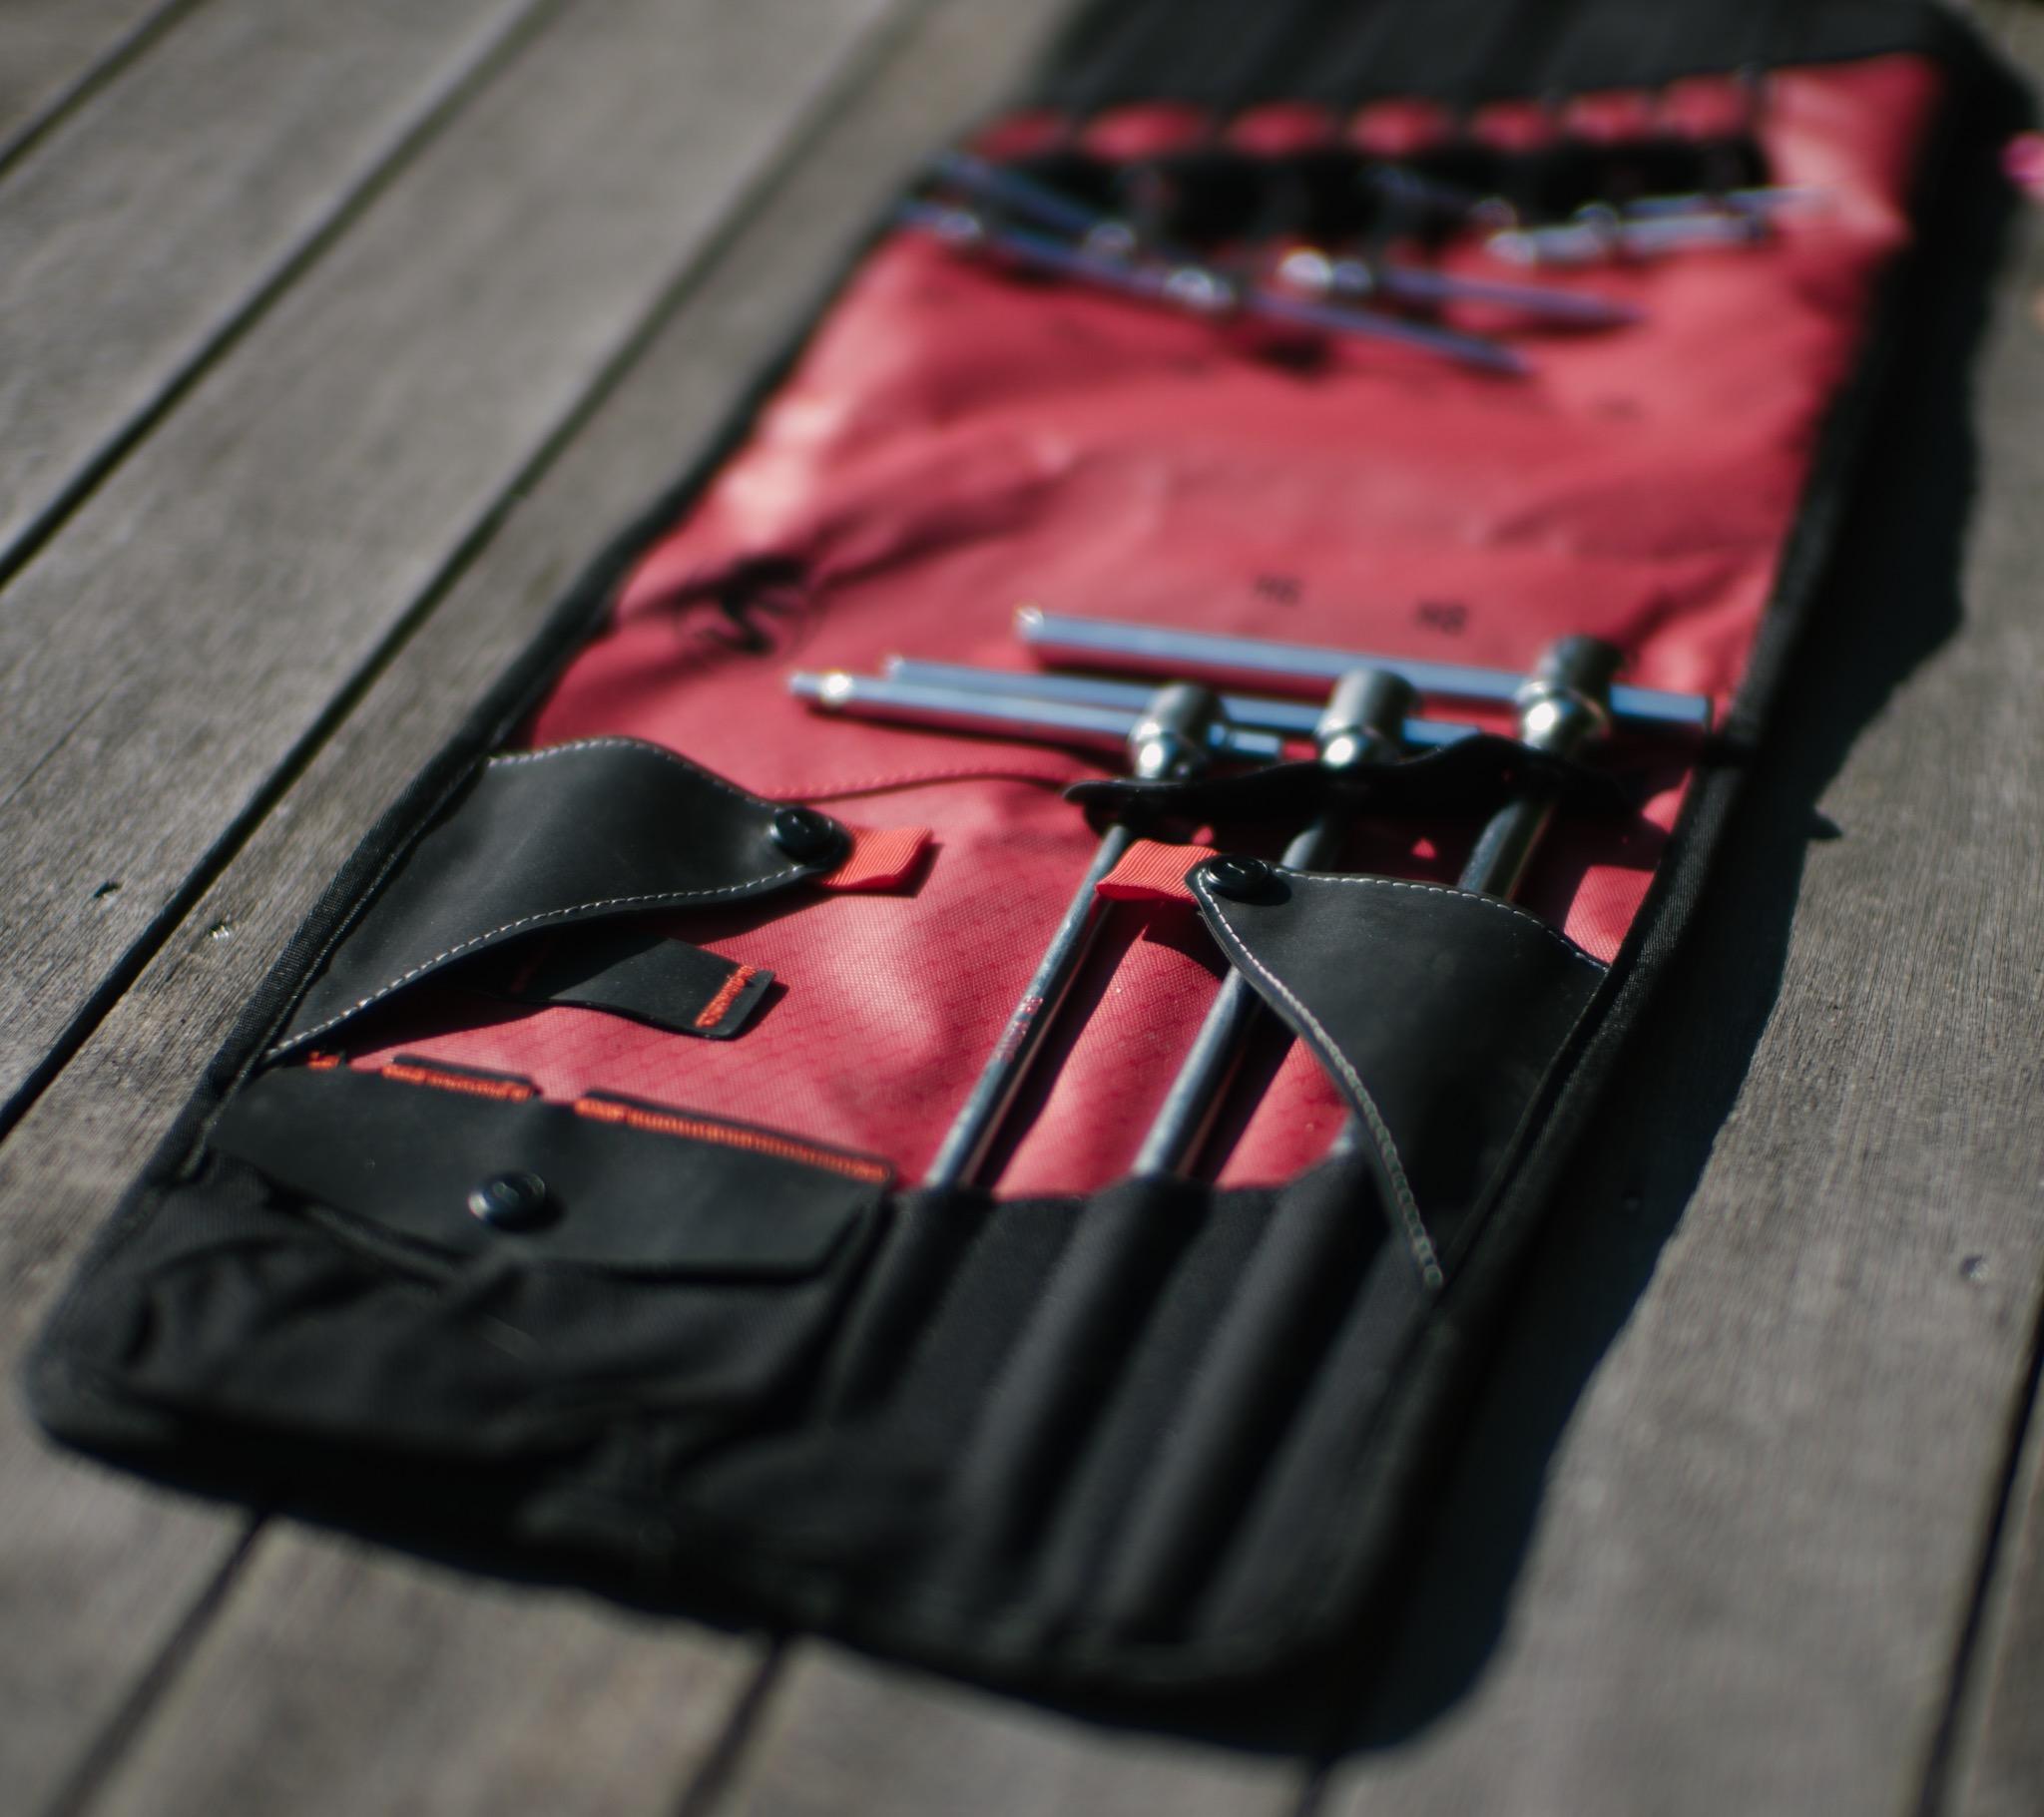 silca-t-handle-folio-review-hex-toolset-4